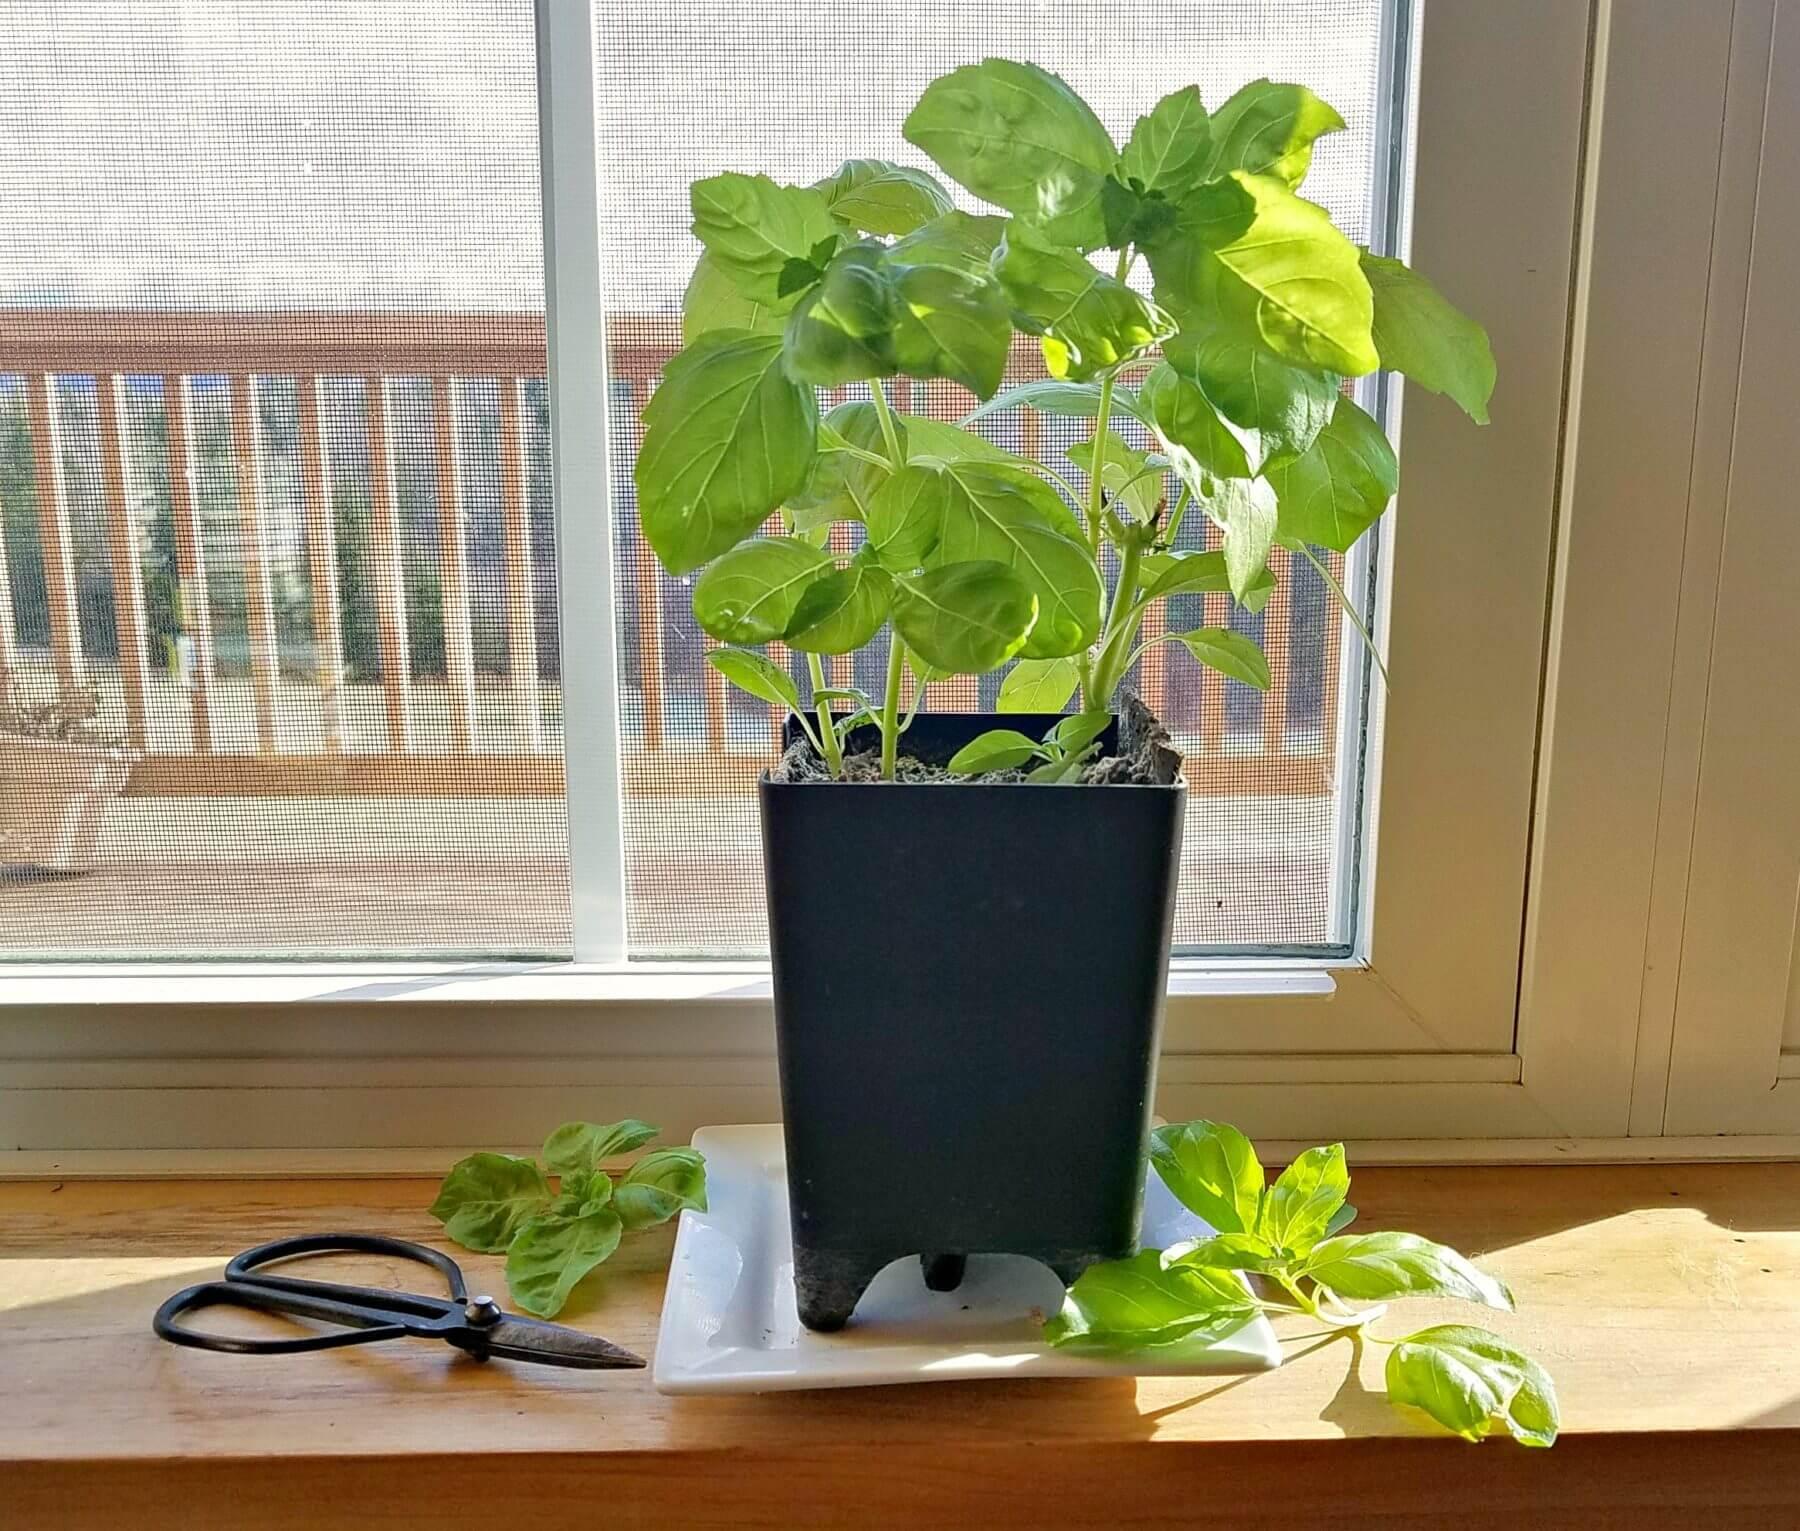 Growing Herbs Indoors Kellogg Garden Products